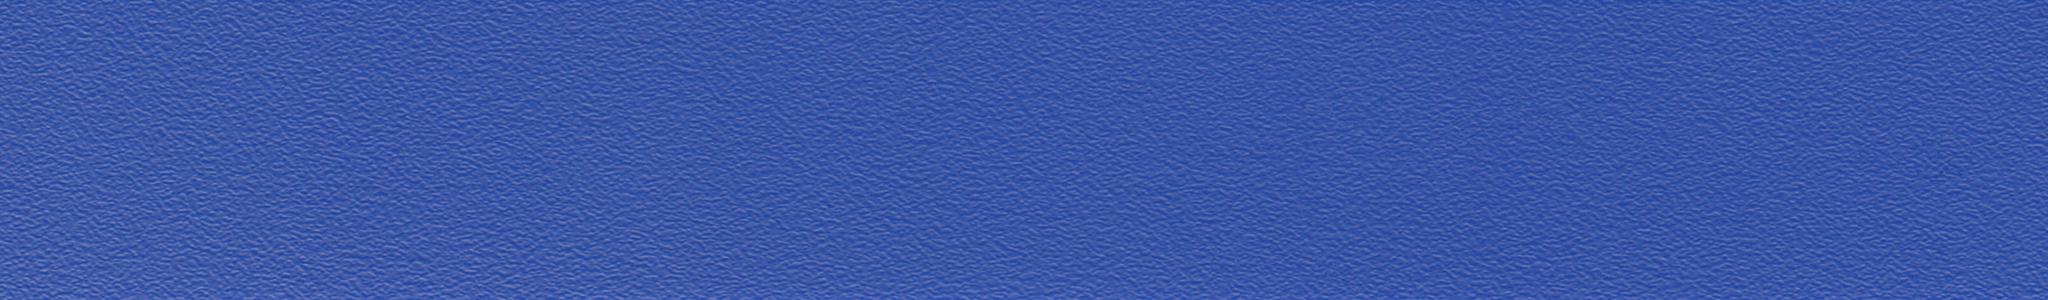 HU 15527 ABS Edge Blue Pearl XG